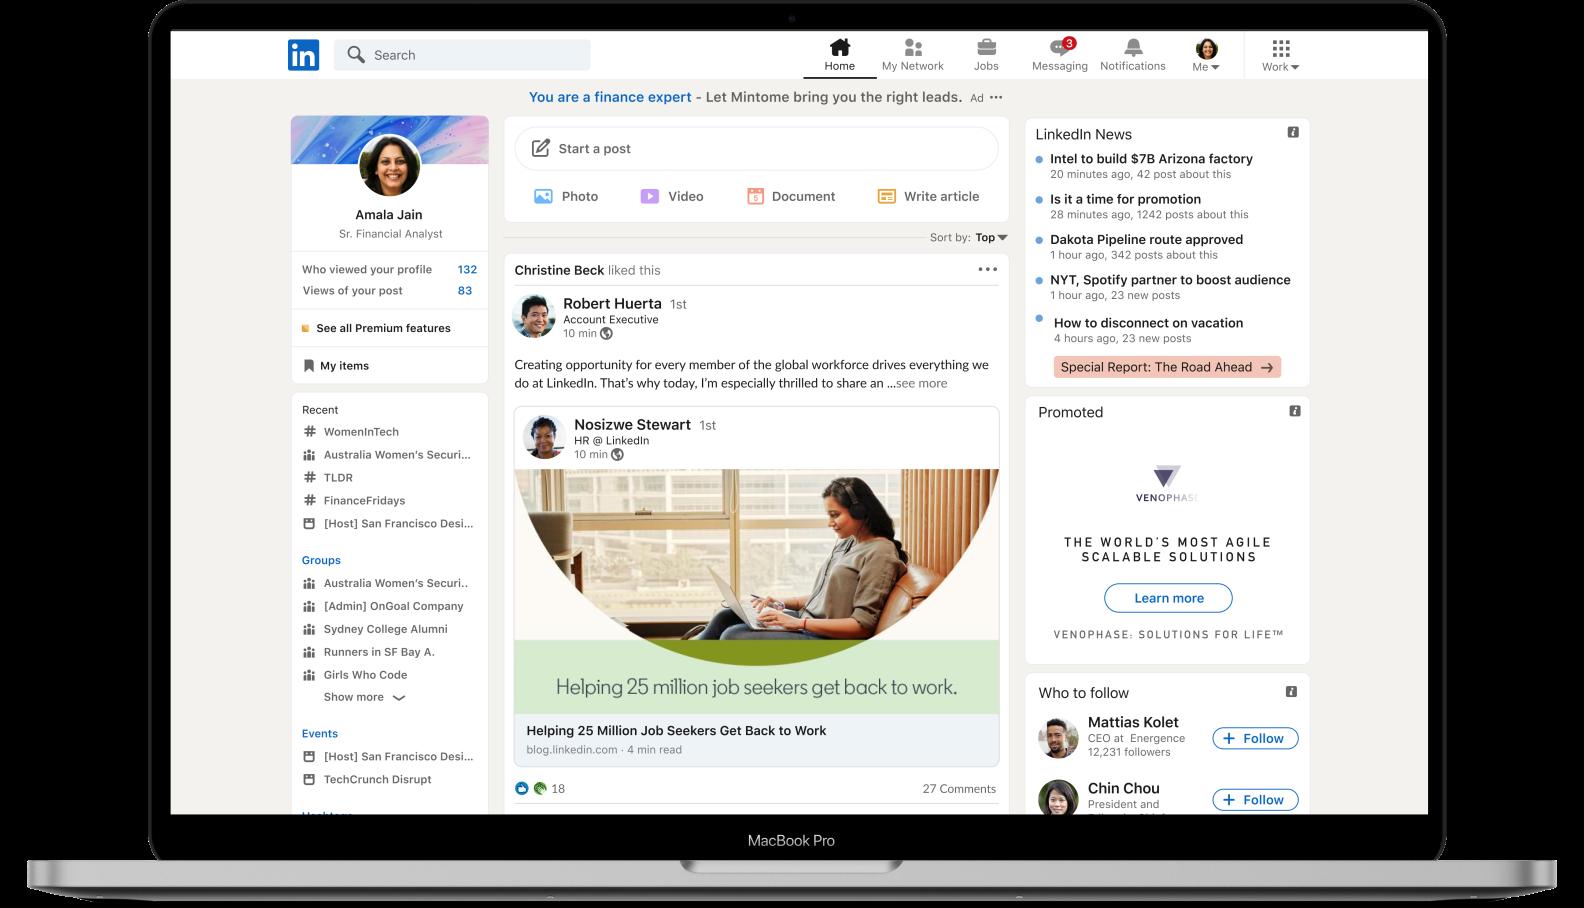 LinkedIn Marketing - VINDICTA Digital